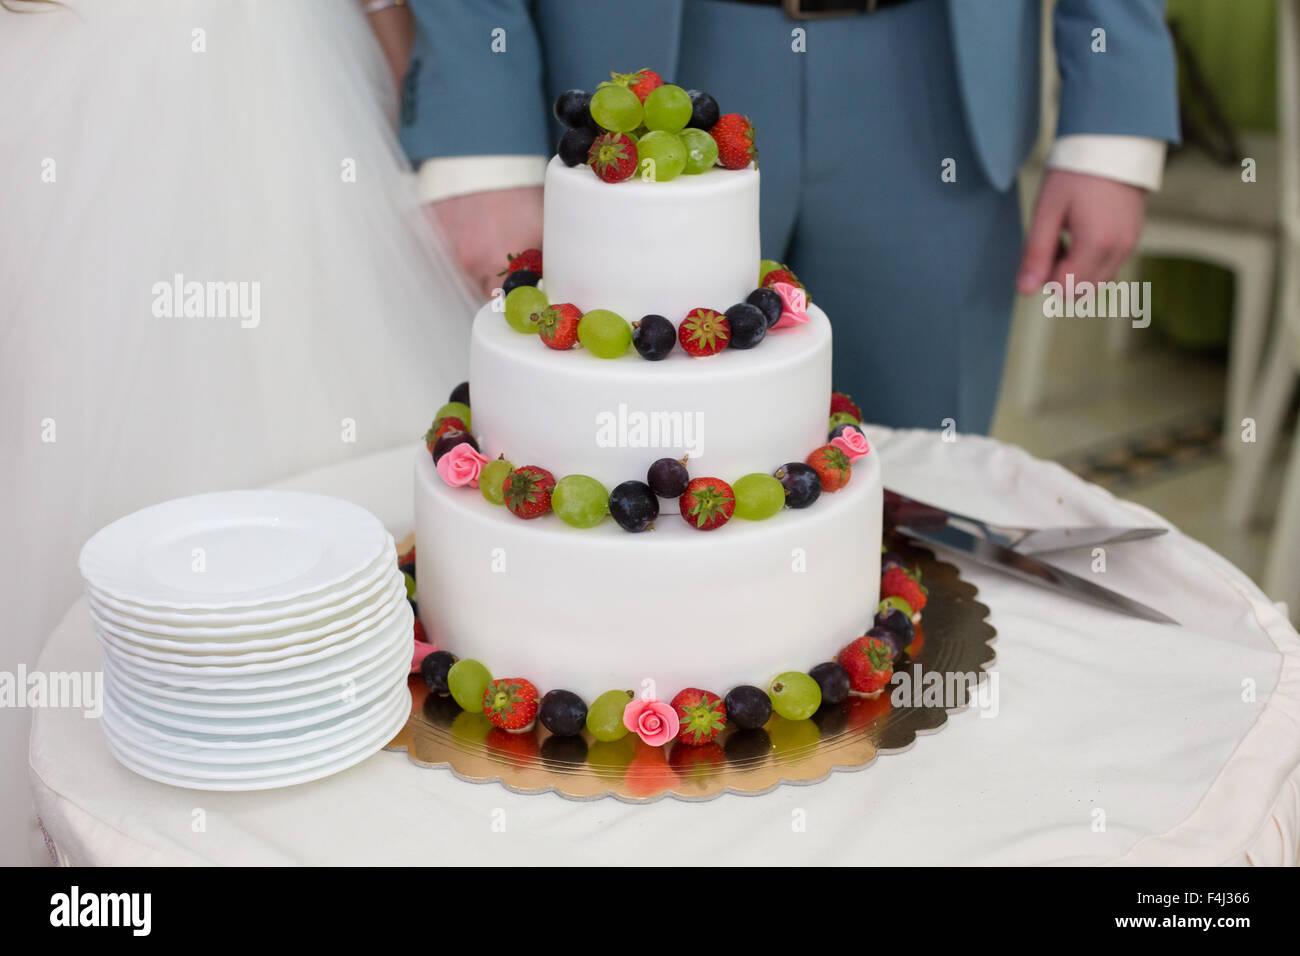 The Couple Cut Wedding Cake